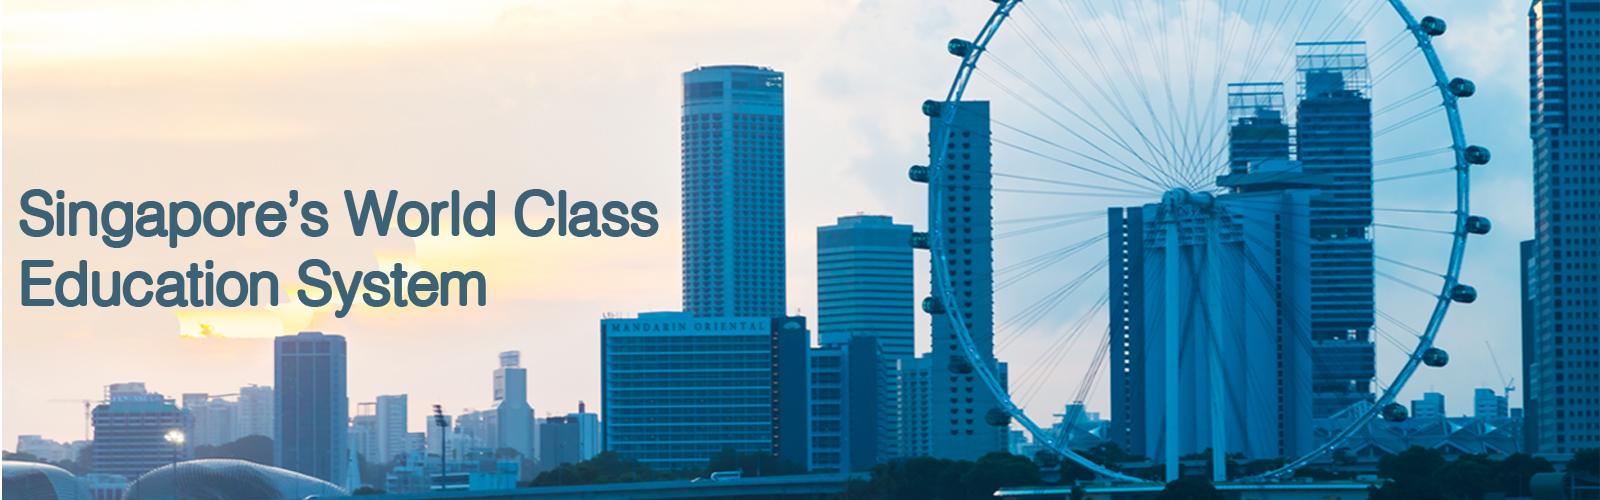 Singapore Education System